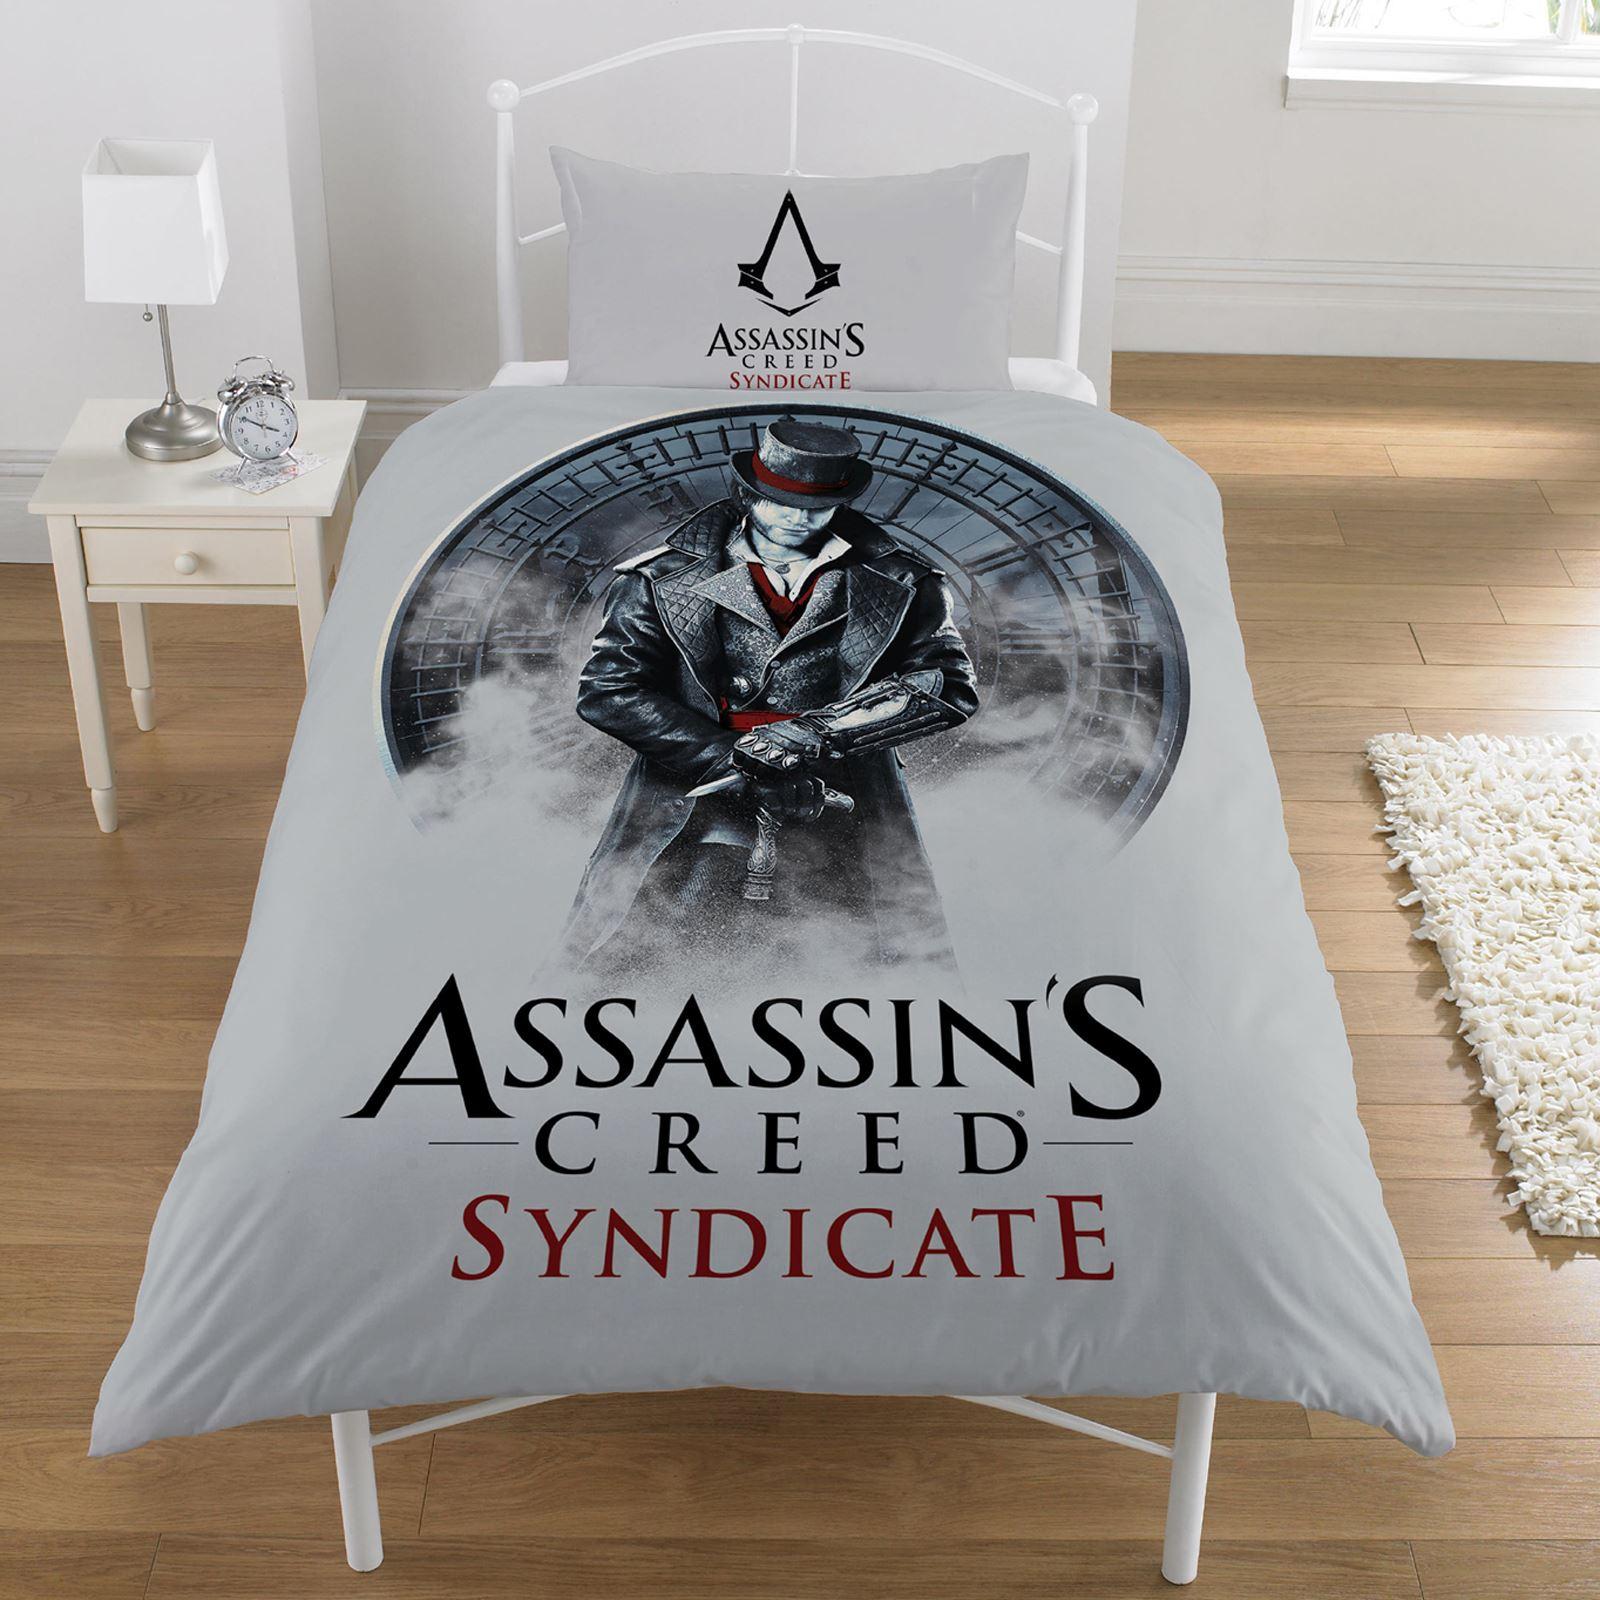 Assassins Creed Duvet Cover Sets Various Designs Boys